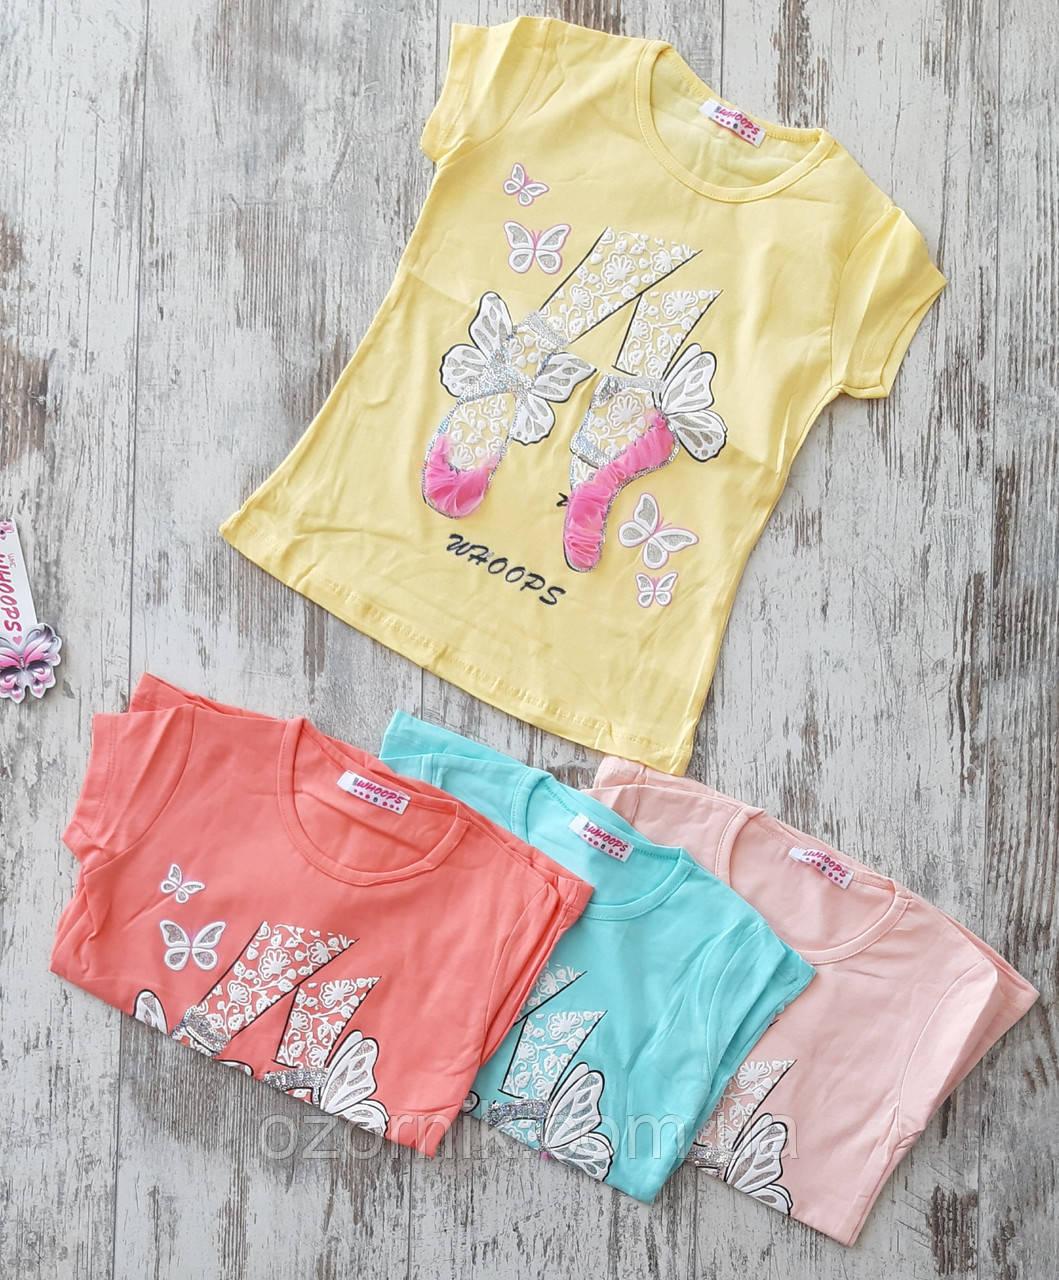 яскрава футболка дівчинка